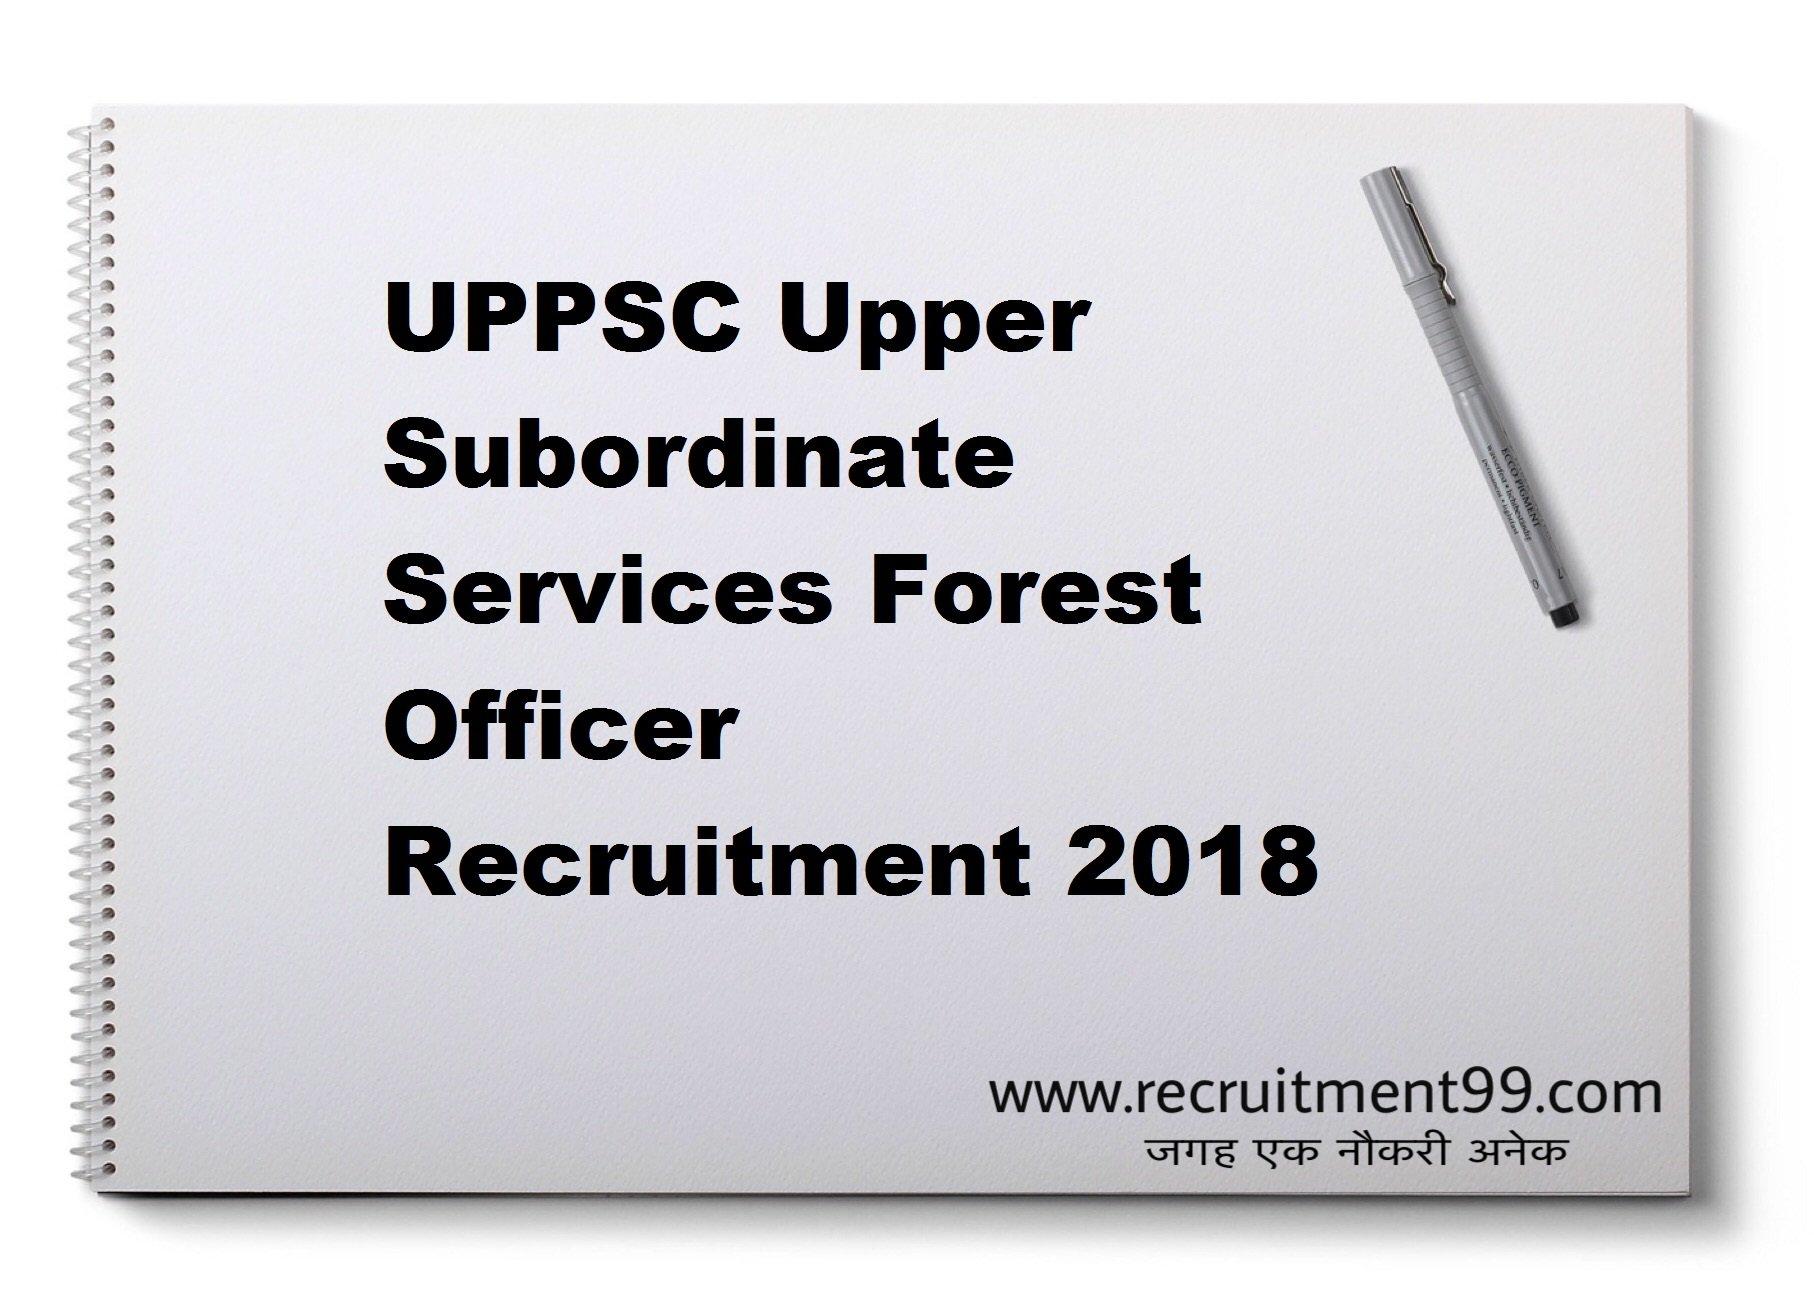 UPPSC Upper Subordinate Services Forest Officer Recruitment Admit Card Result 2018